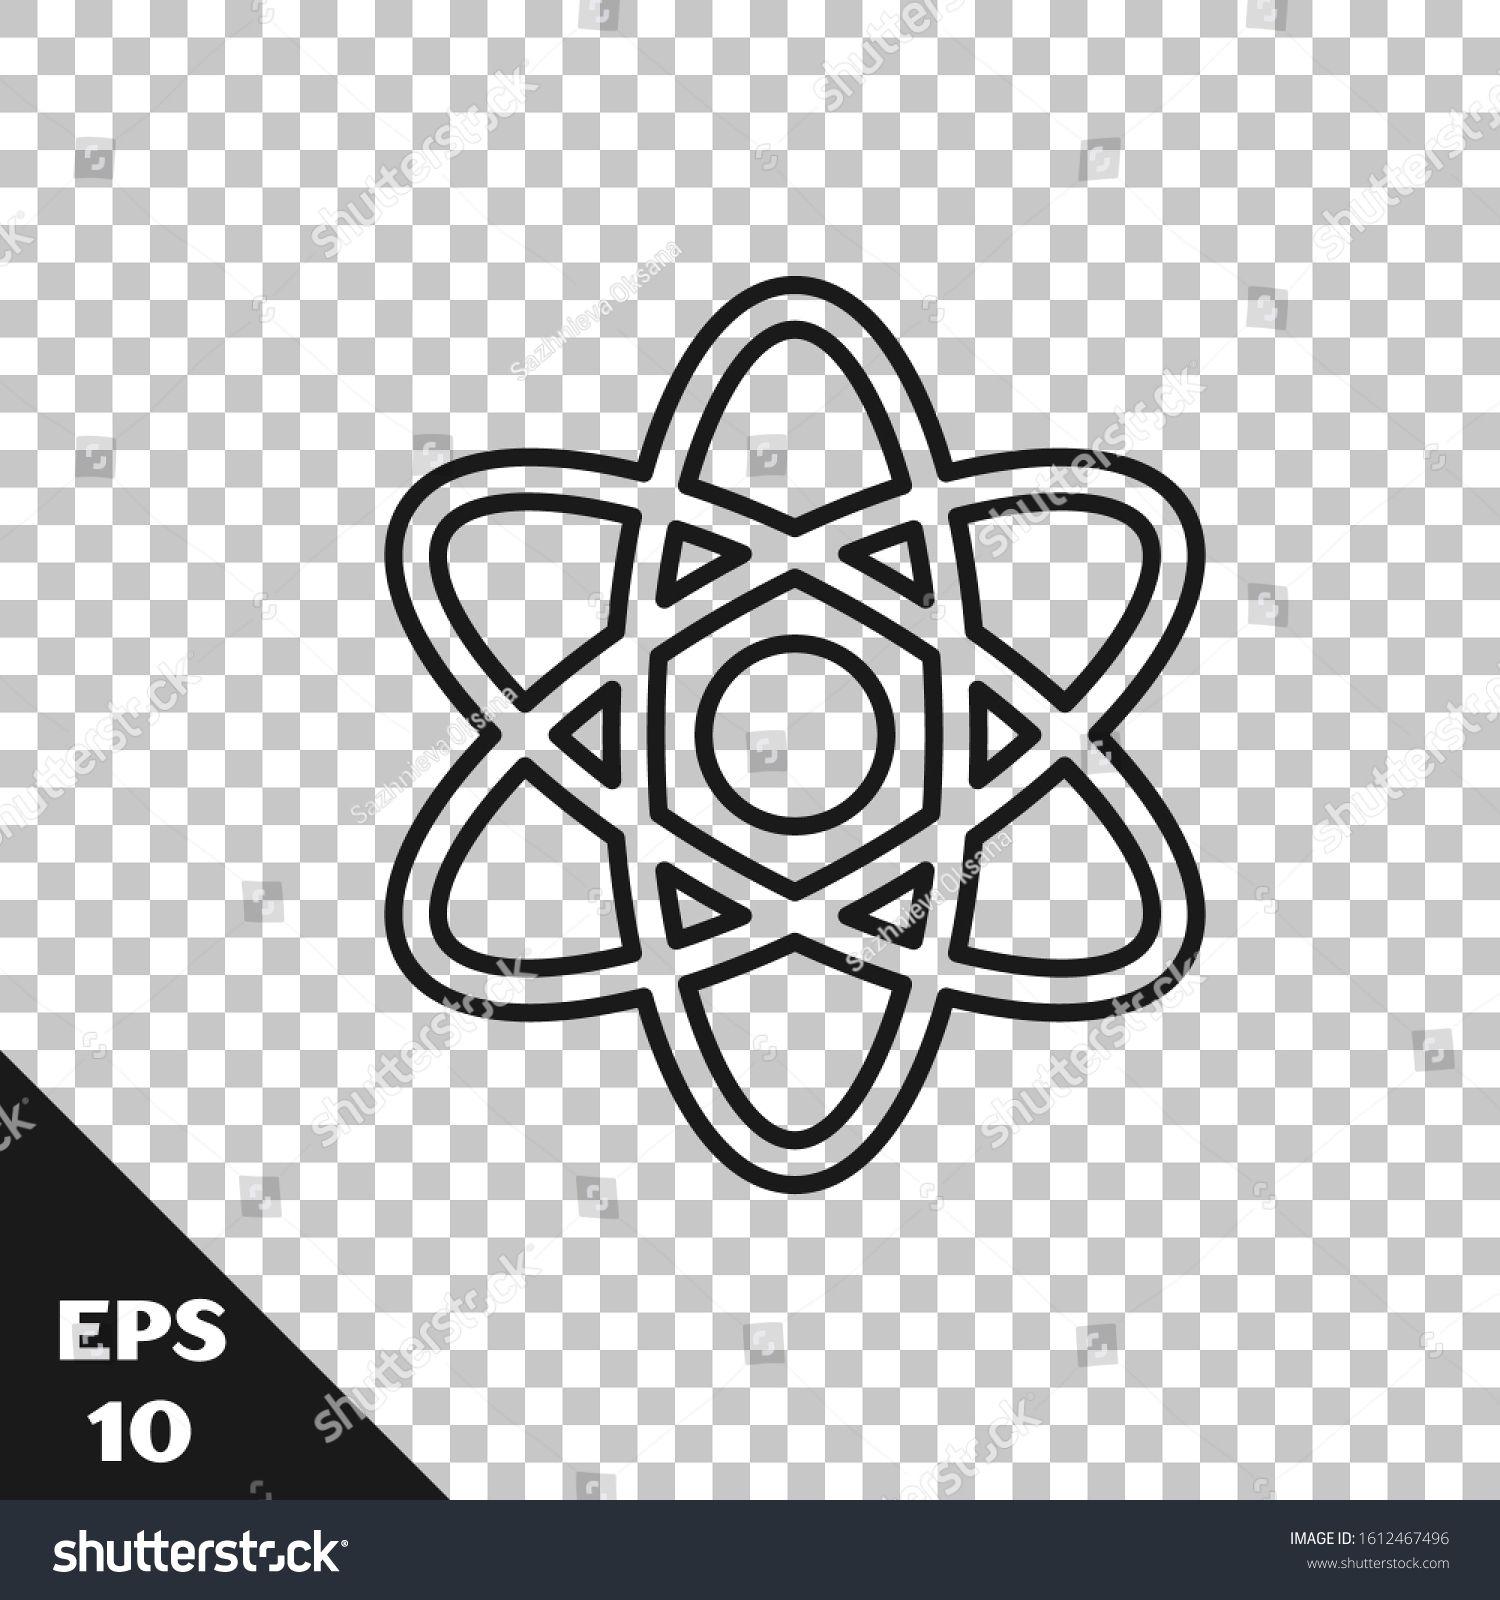 Black Line Atom Icon Isolated On Transparent Background Symbol Of